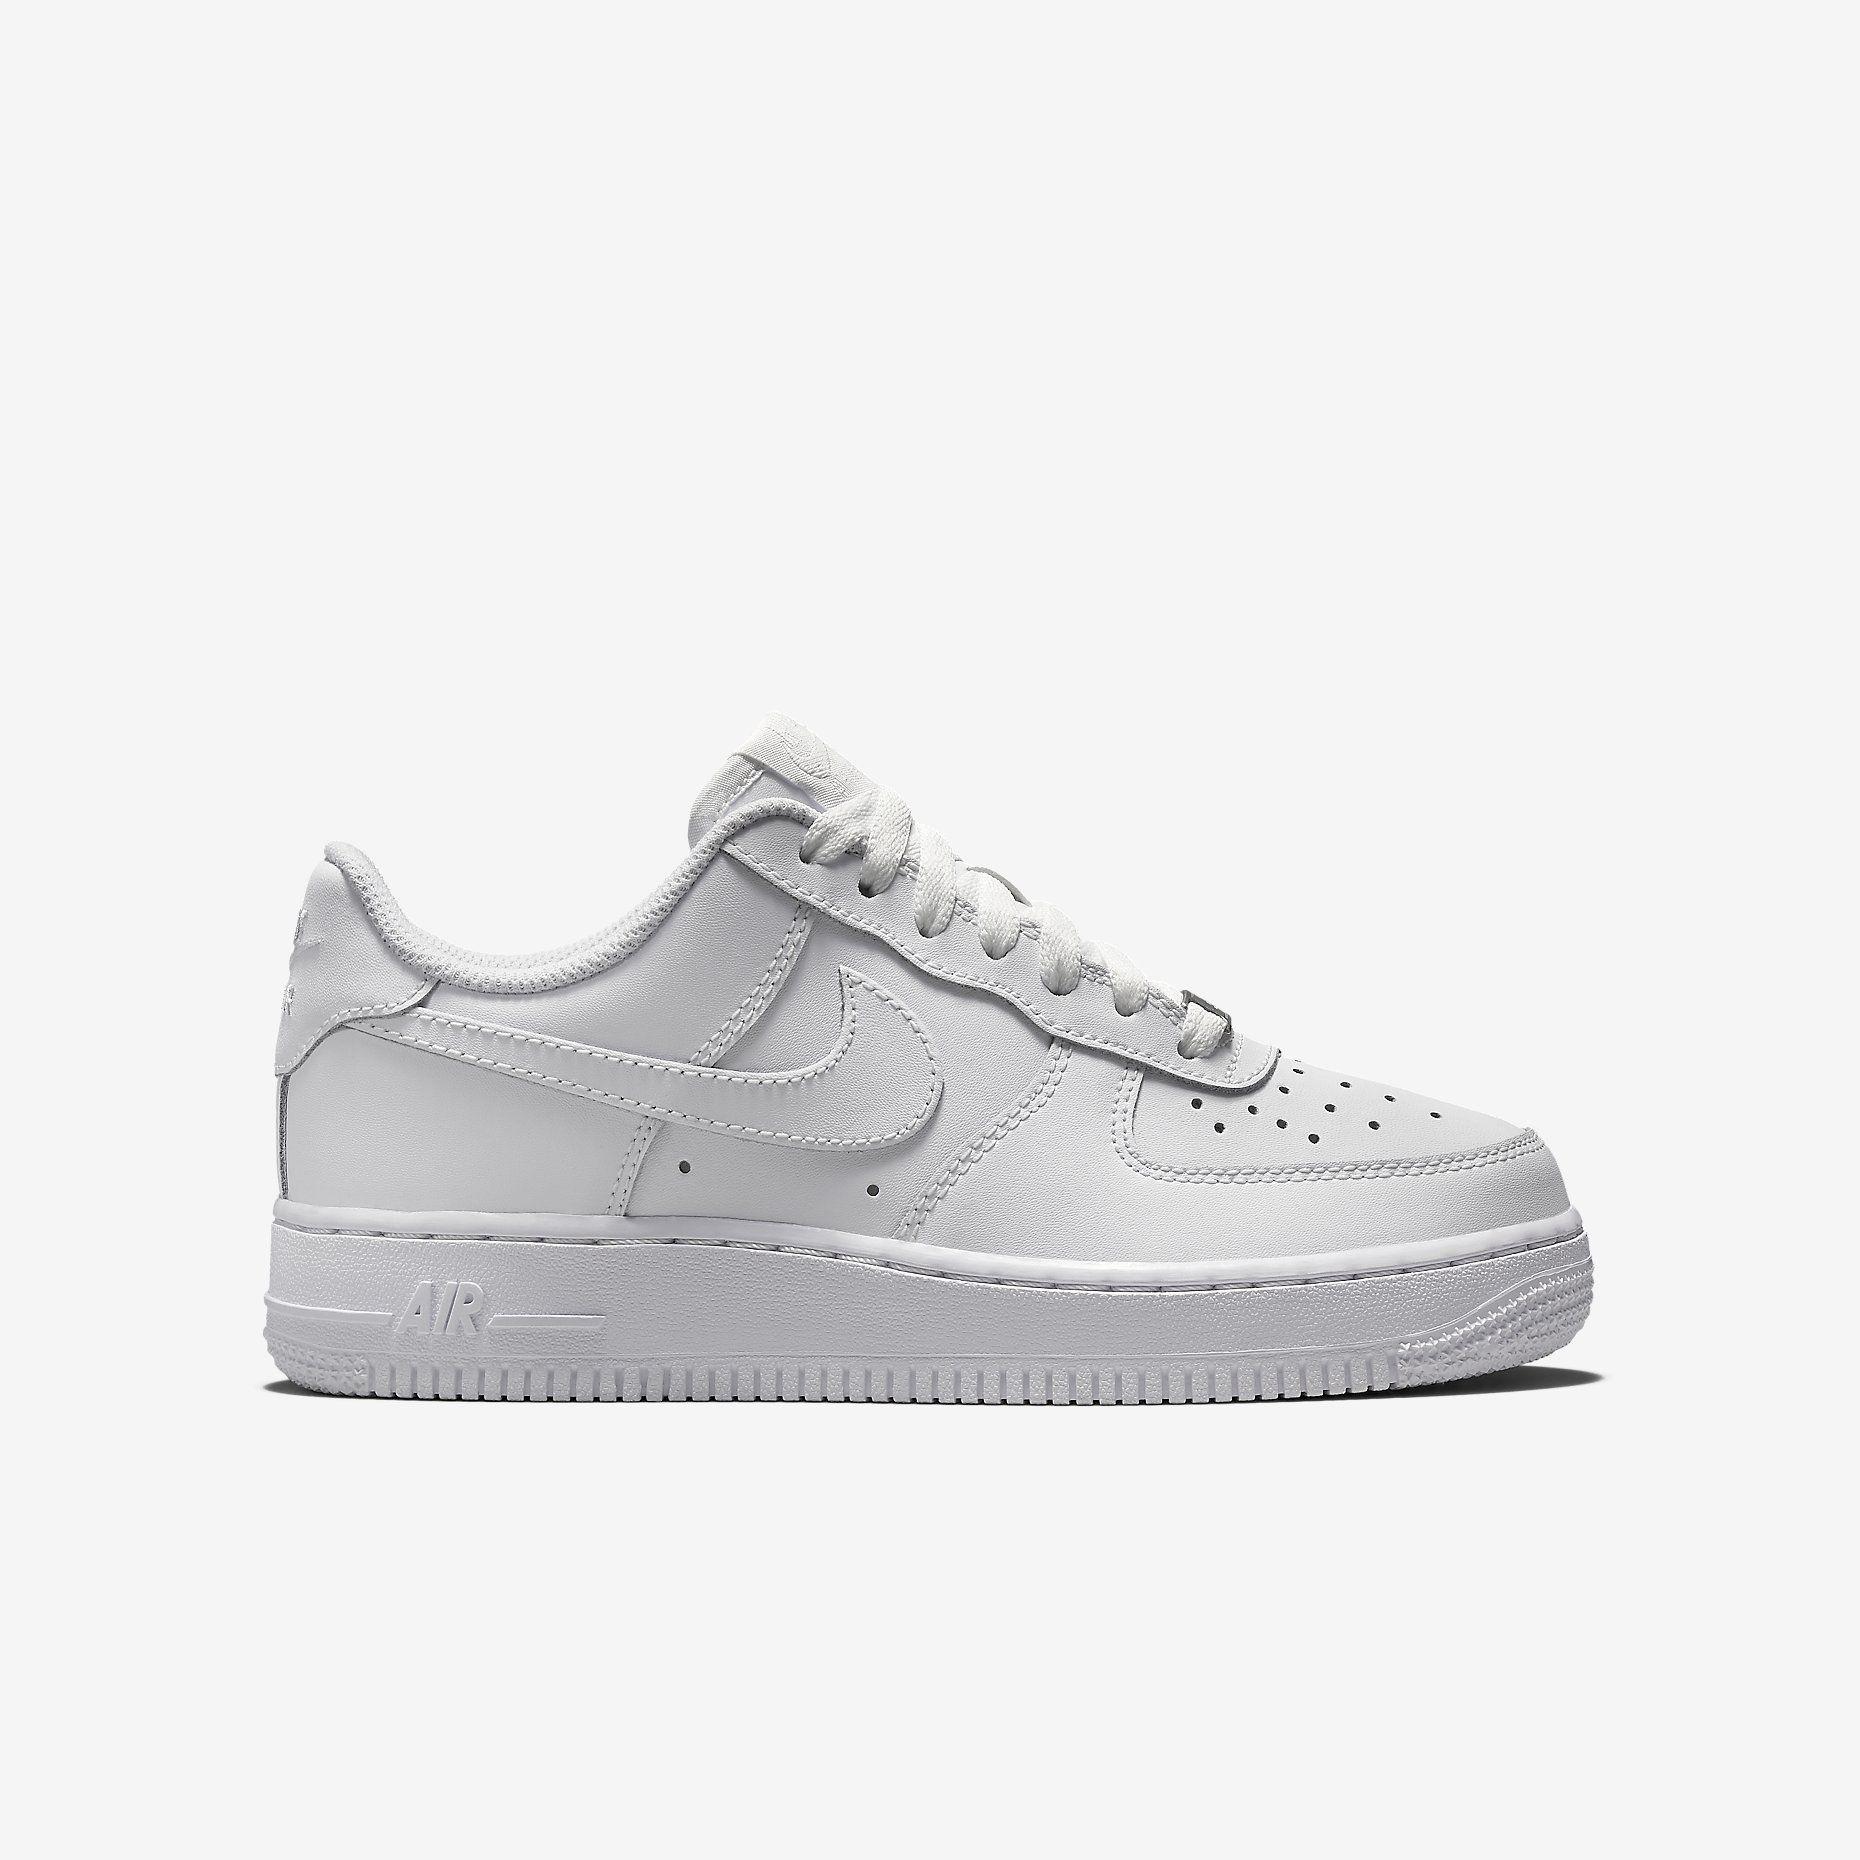 Air Force 1 Schuh Fur Altere Kinder Nike De Nike Air Force Nike Air Kids Shoes